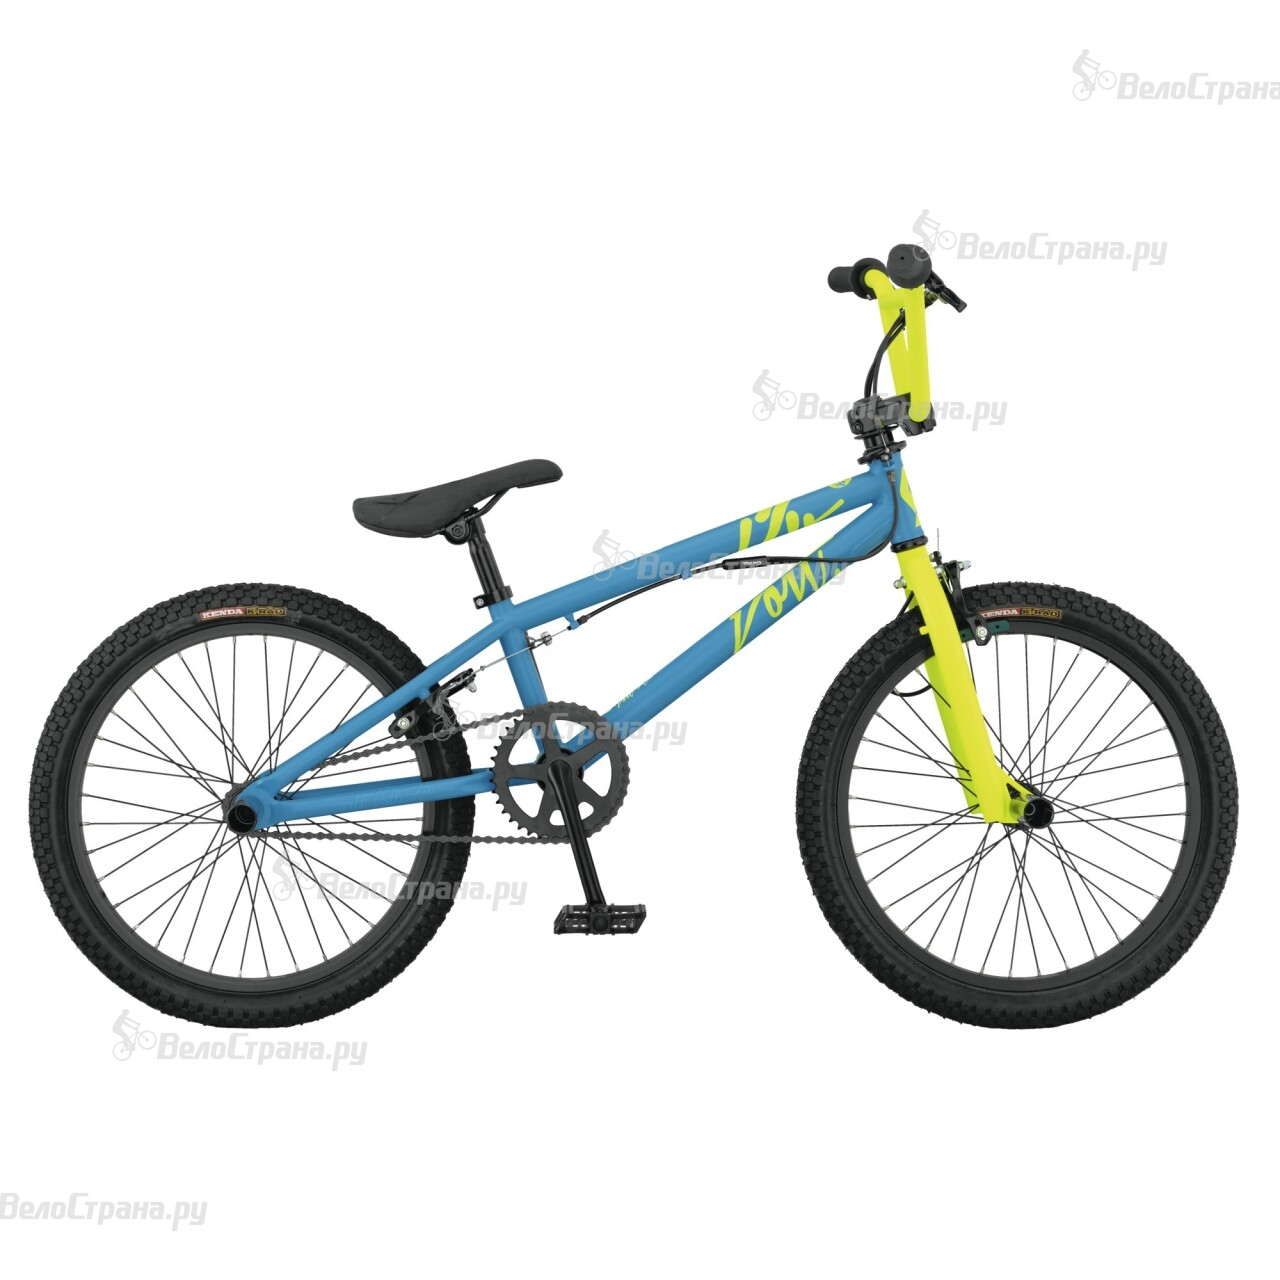 Велосипед Scott Volt-X 30 (2015) маяк findme f2 volt